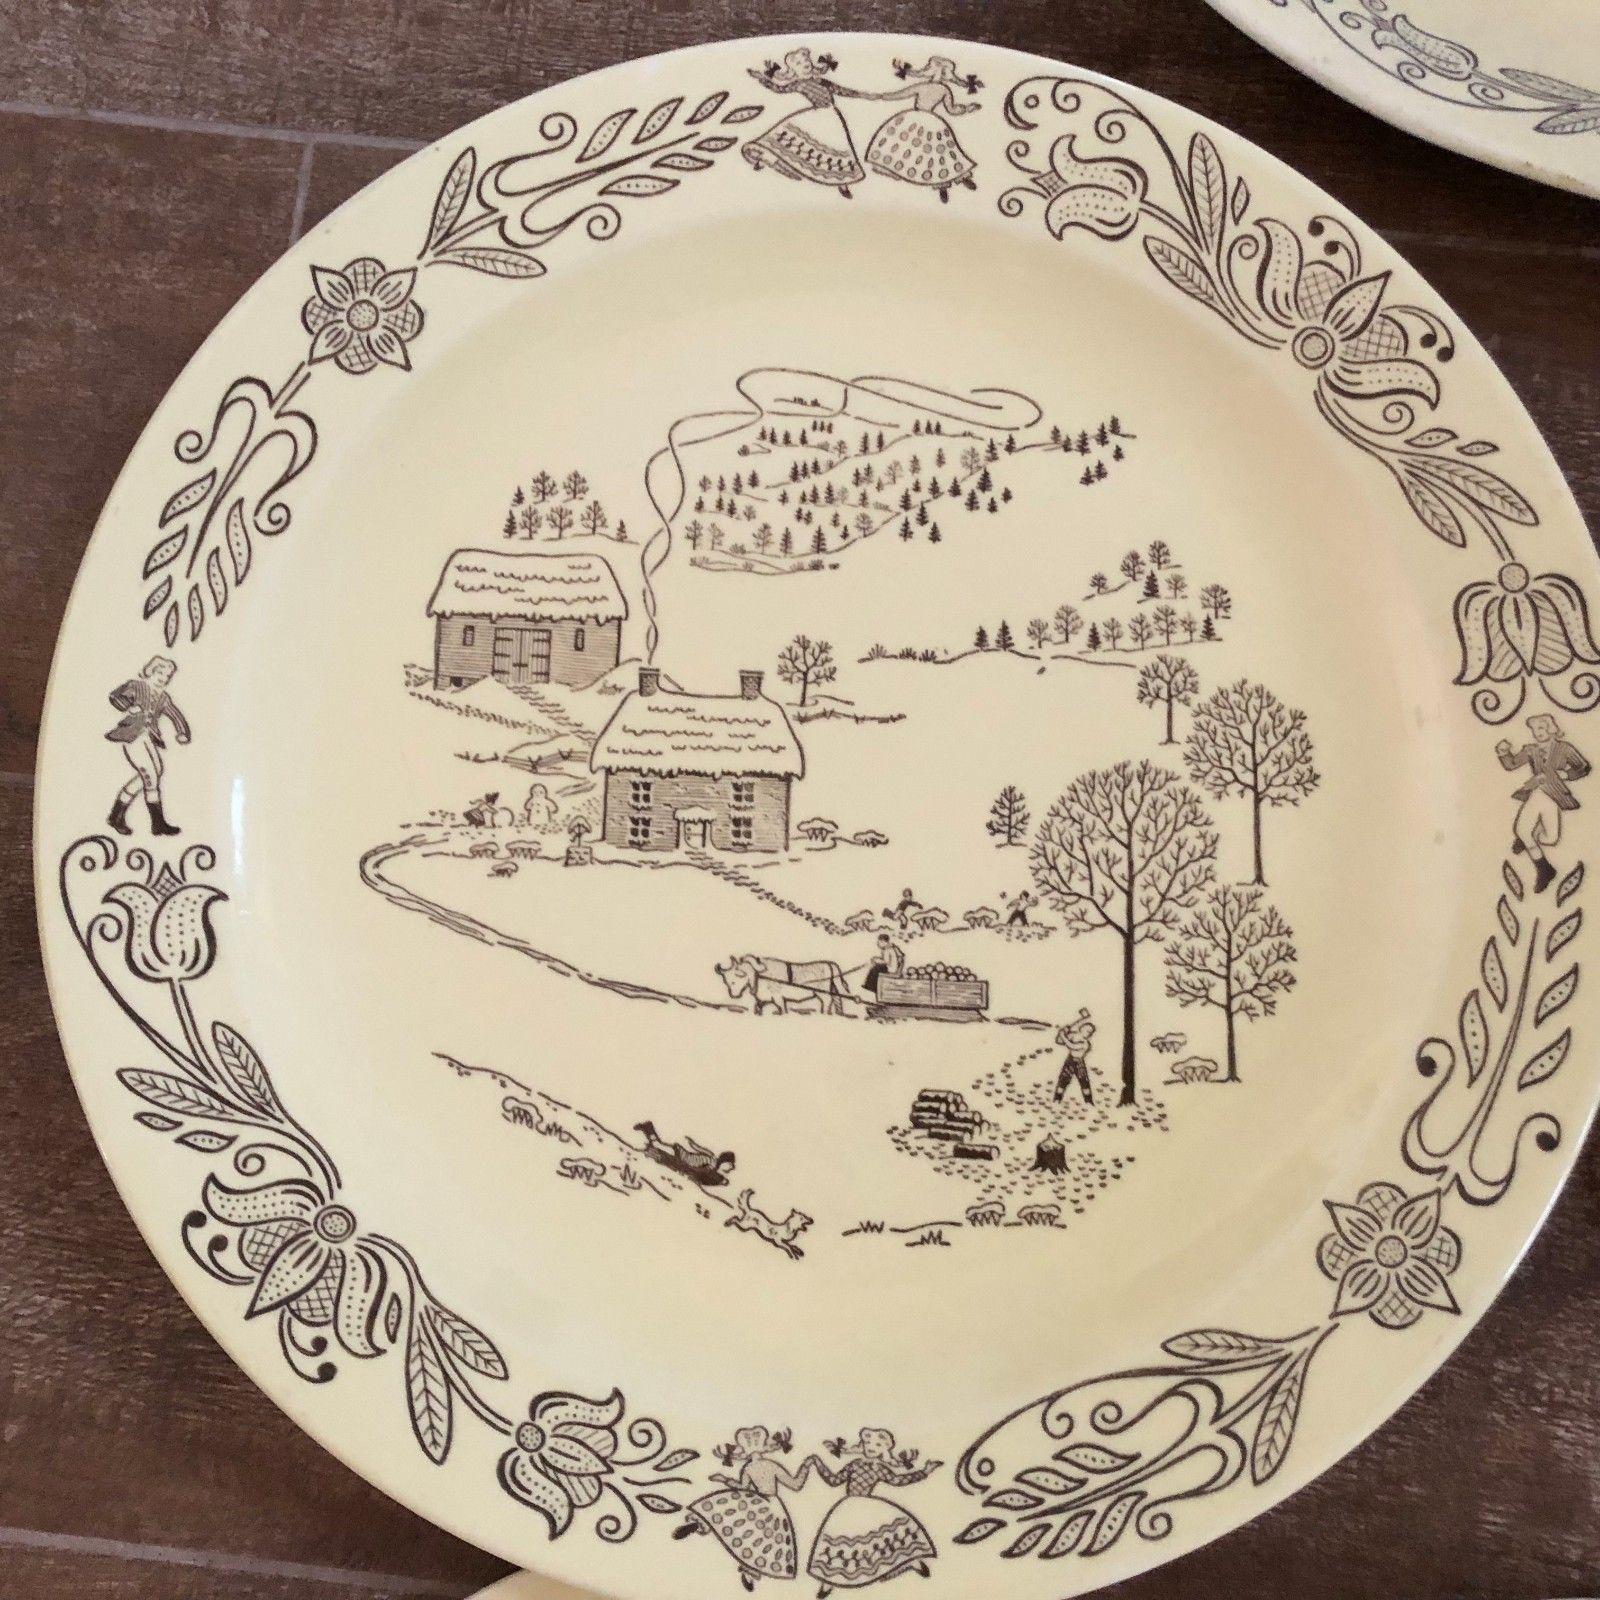 Bucks County china vintage serving platter salt pepper Sebring Ohio royal lot